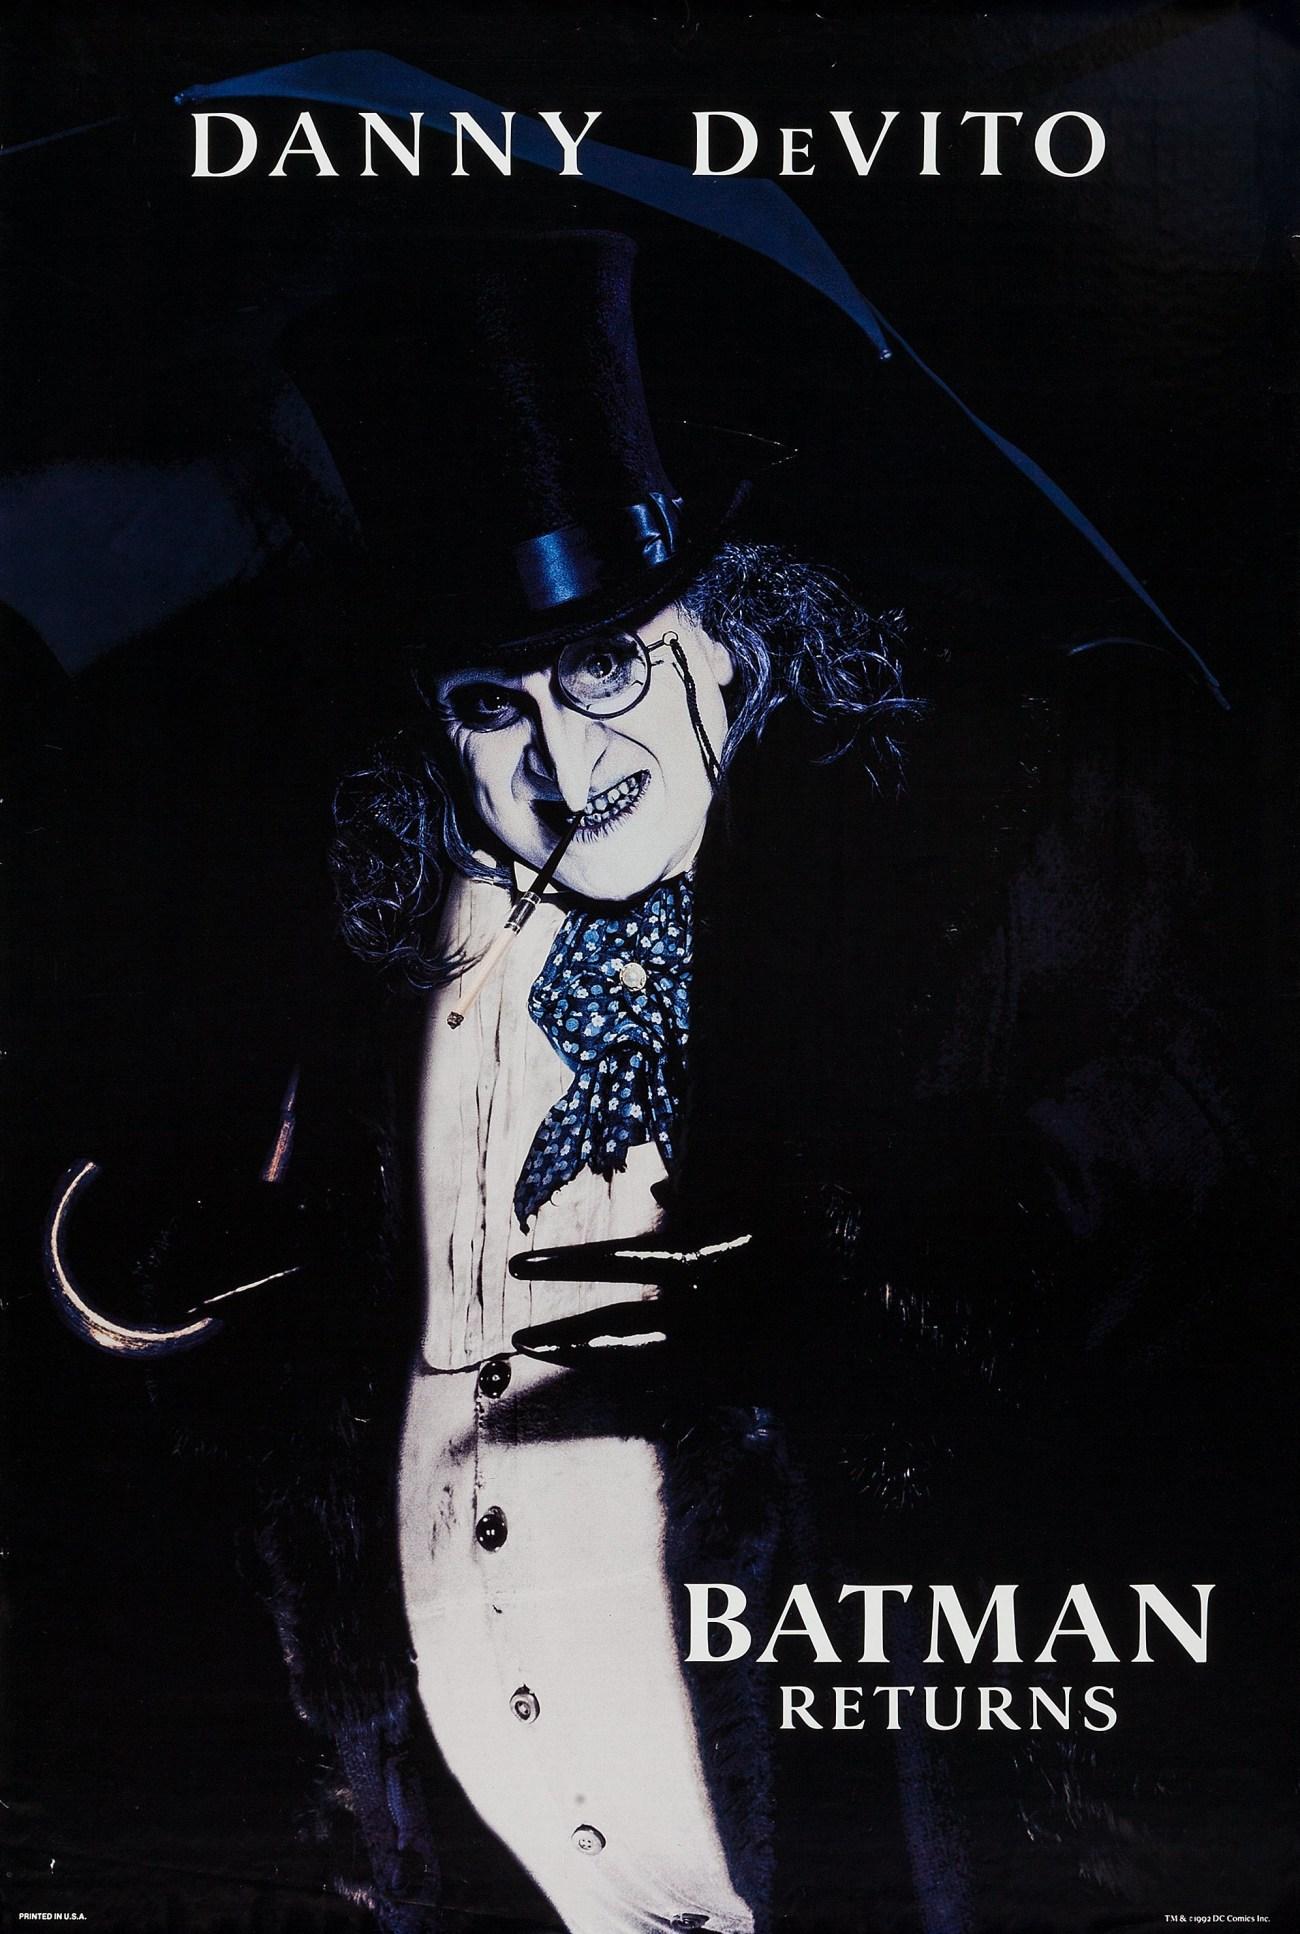 The Penguin (Danny DeVito) en un póster de Batman Returns (1992). Imagen: impawards